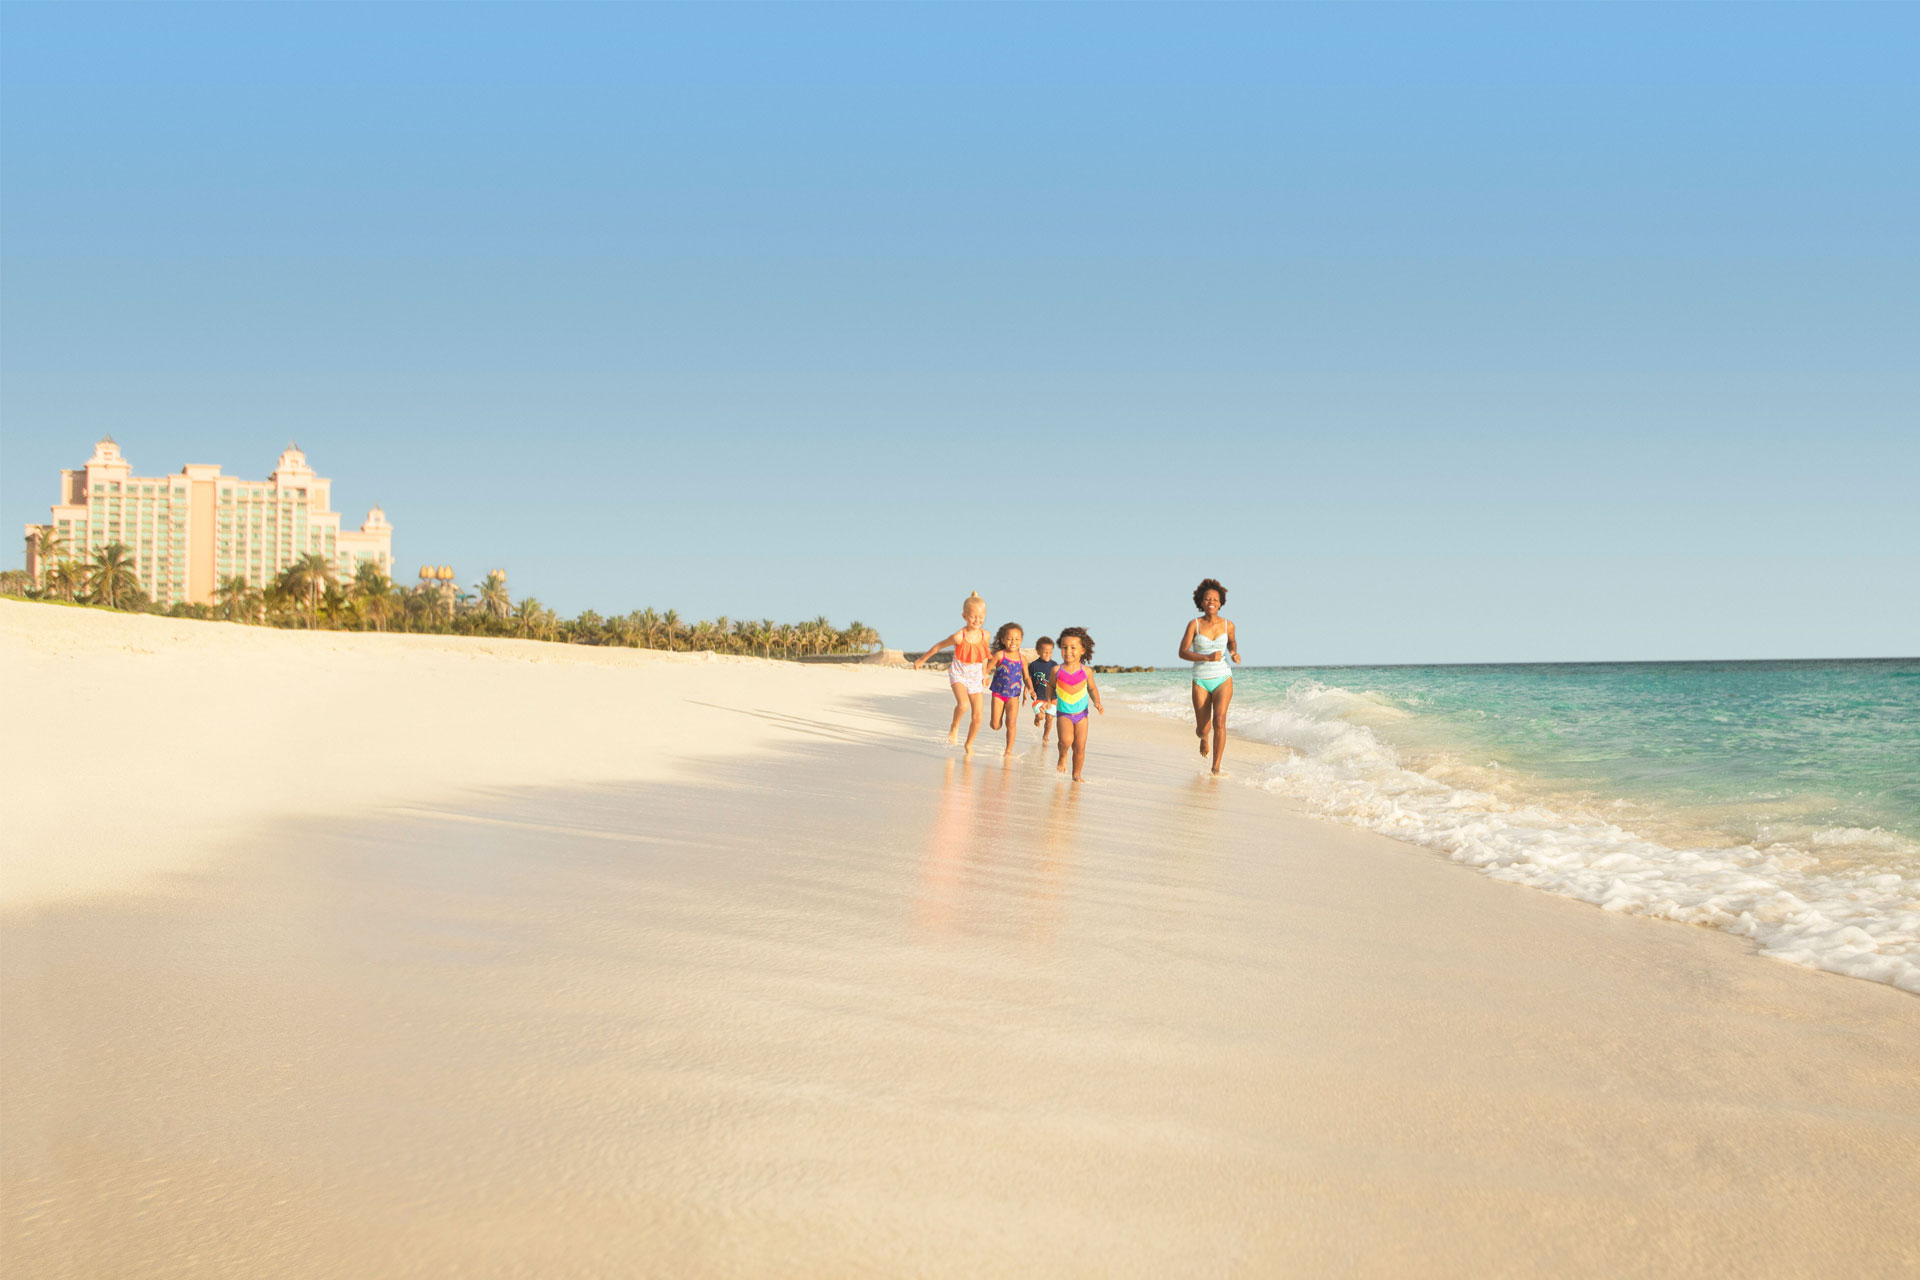 Atlantis Beach; Courtesy of Atlantis Resort